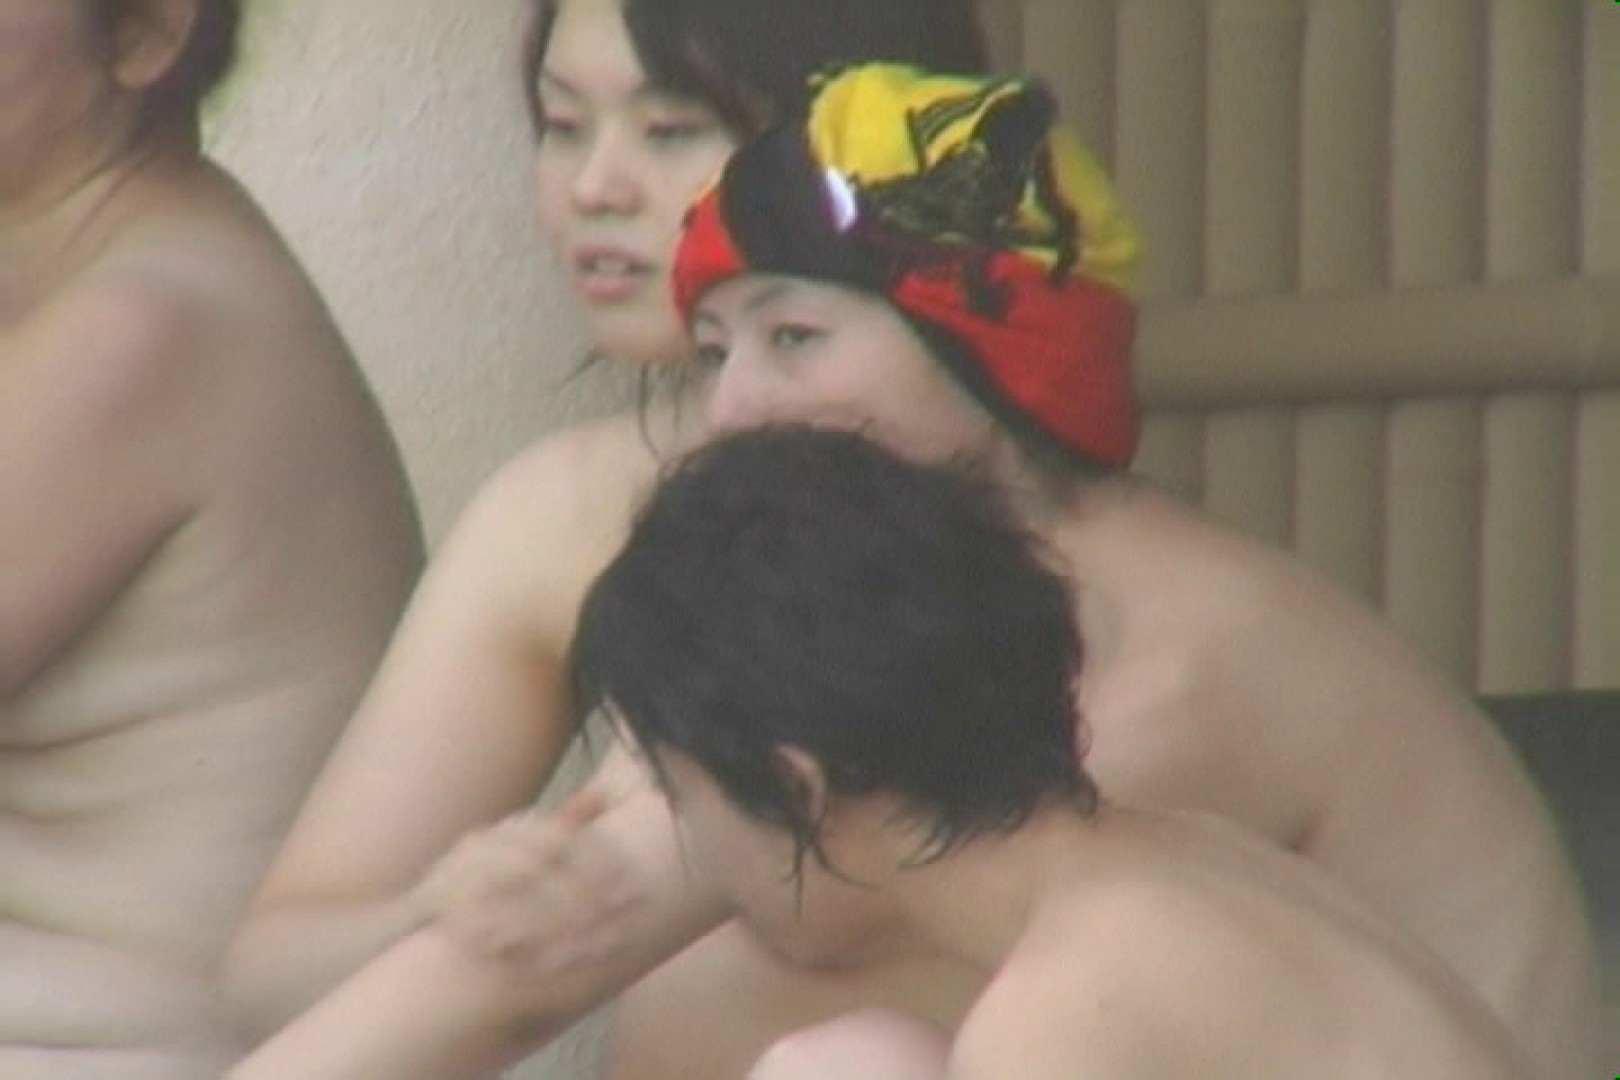 Aquaな露天風呂Vol.61【VIP限定】 露天 | OL女体  102連発 28